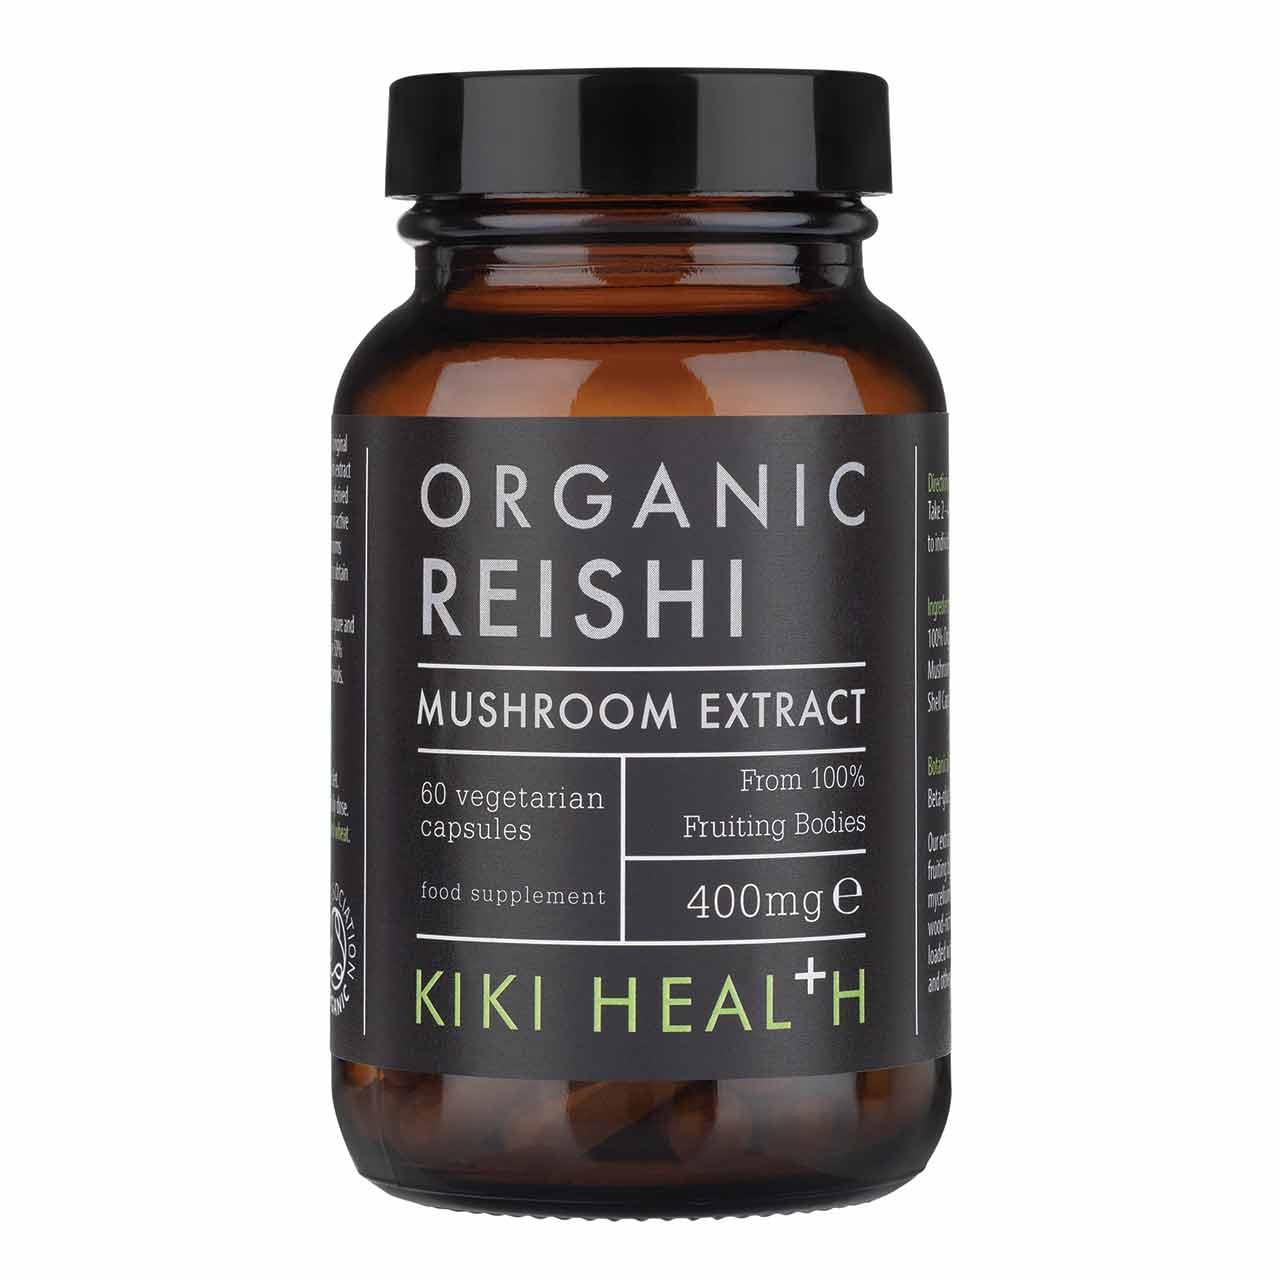 Organic Reishi Mushroom Extract 60's